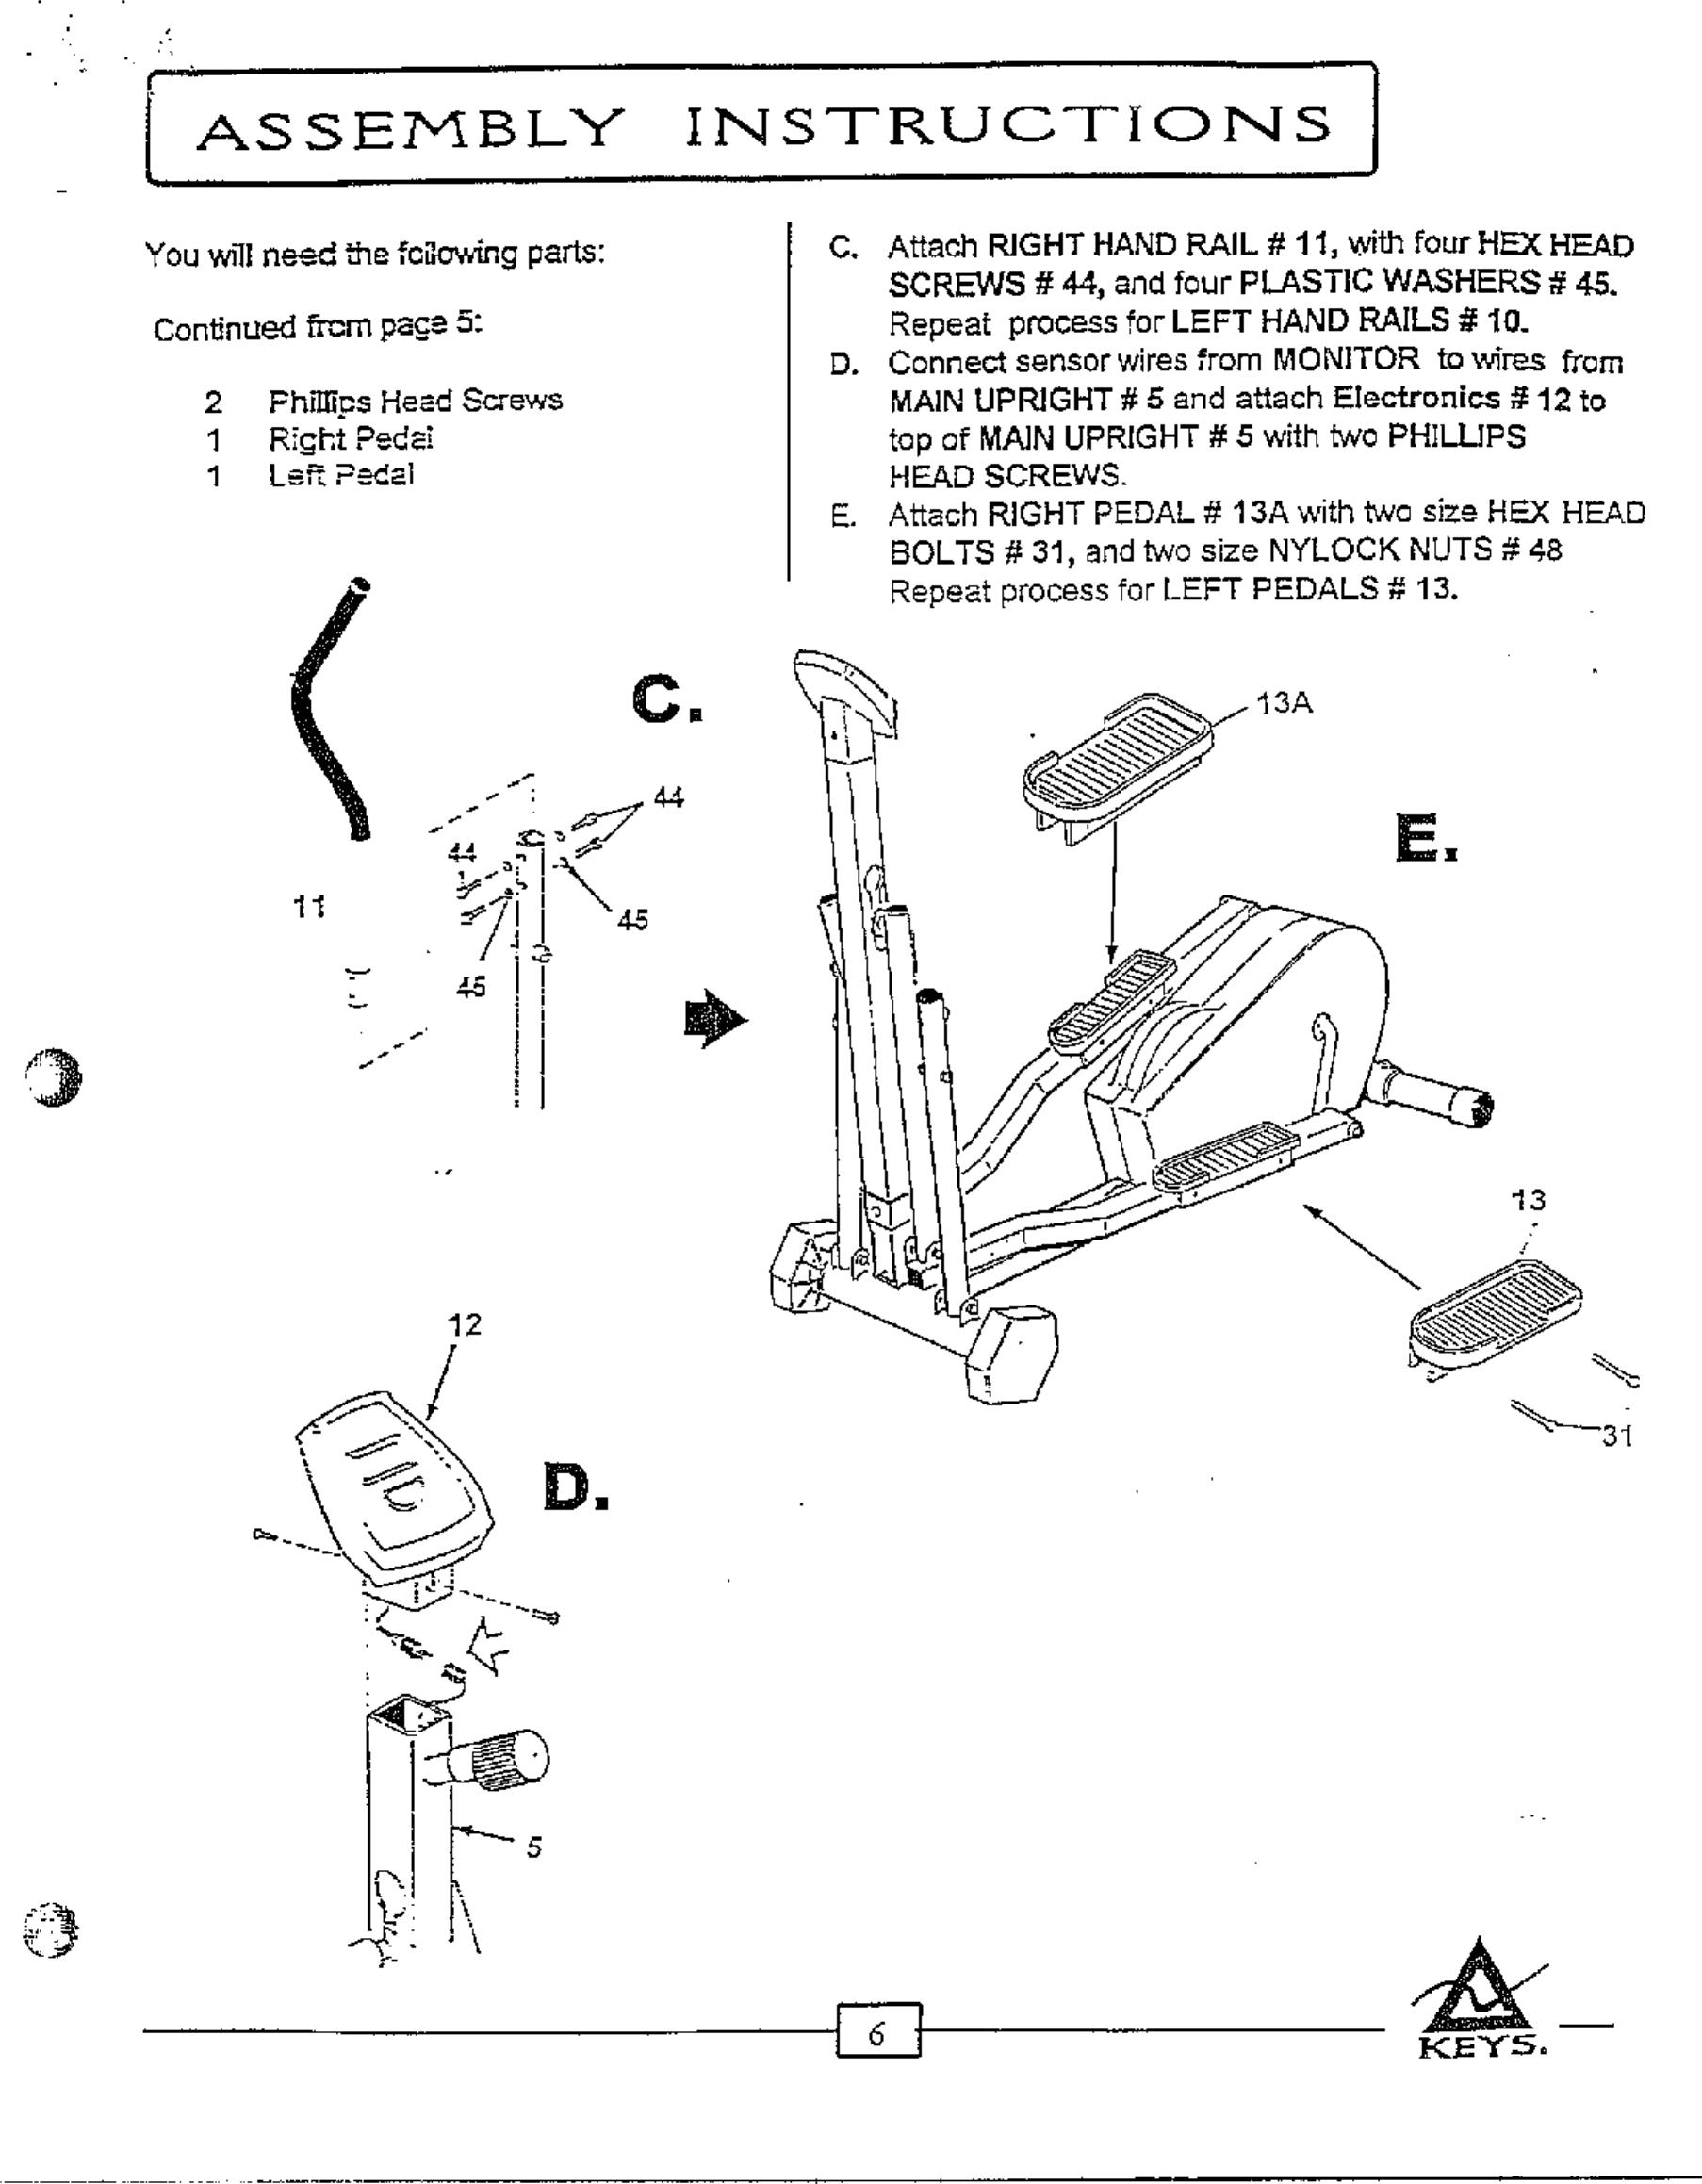 Keys ET 2000 User Manual KEY ELLIPITICAL TRAINER Manuals And ...